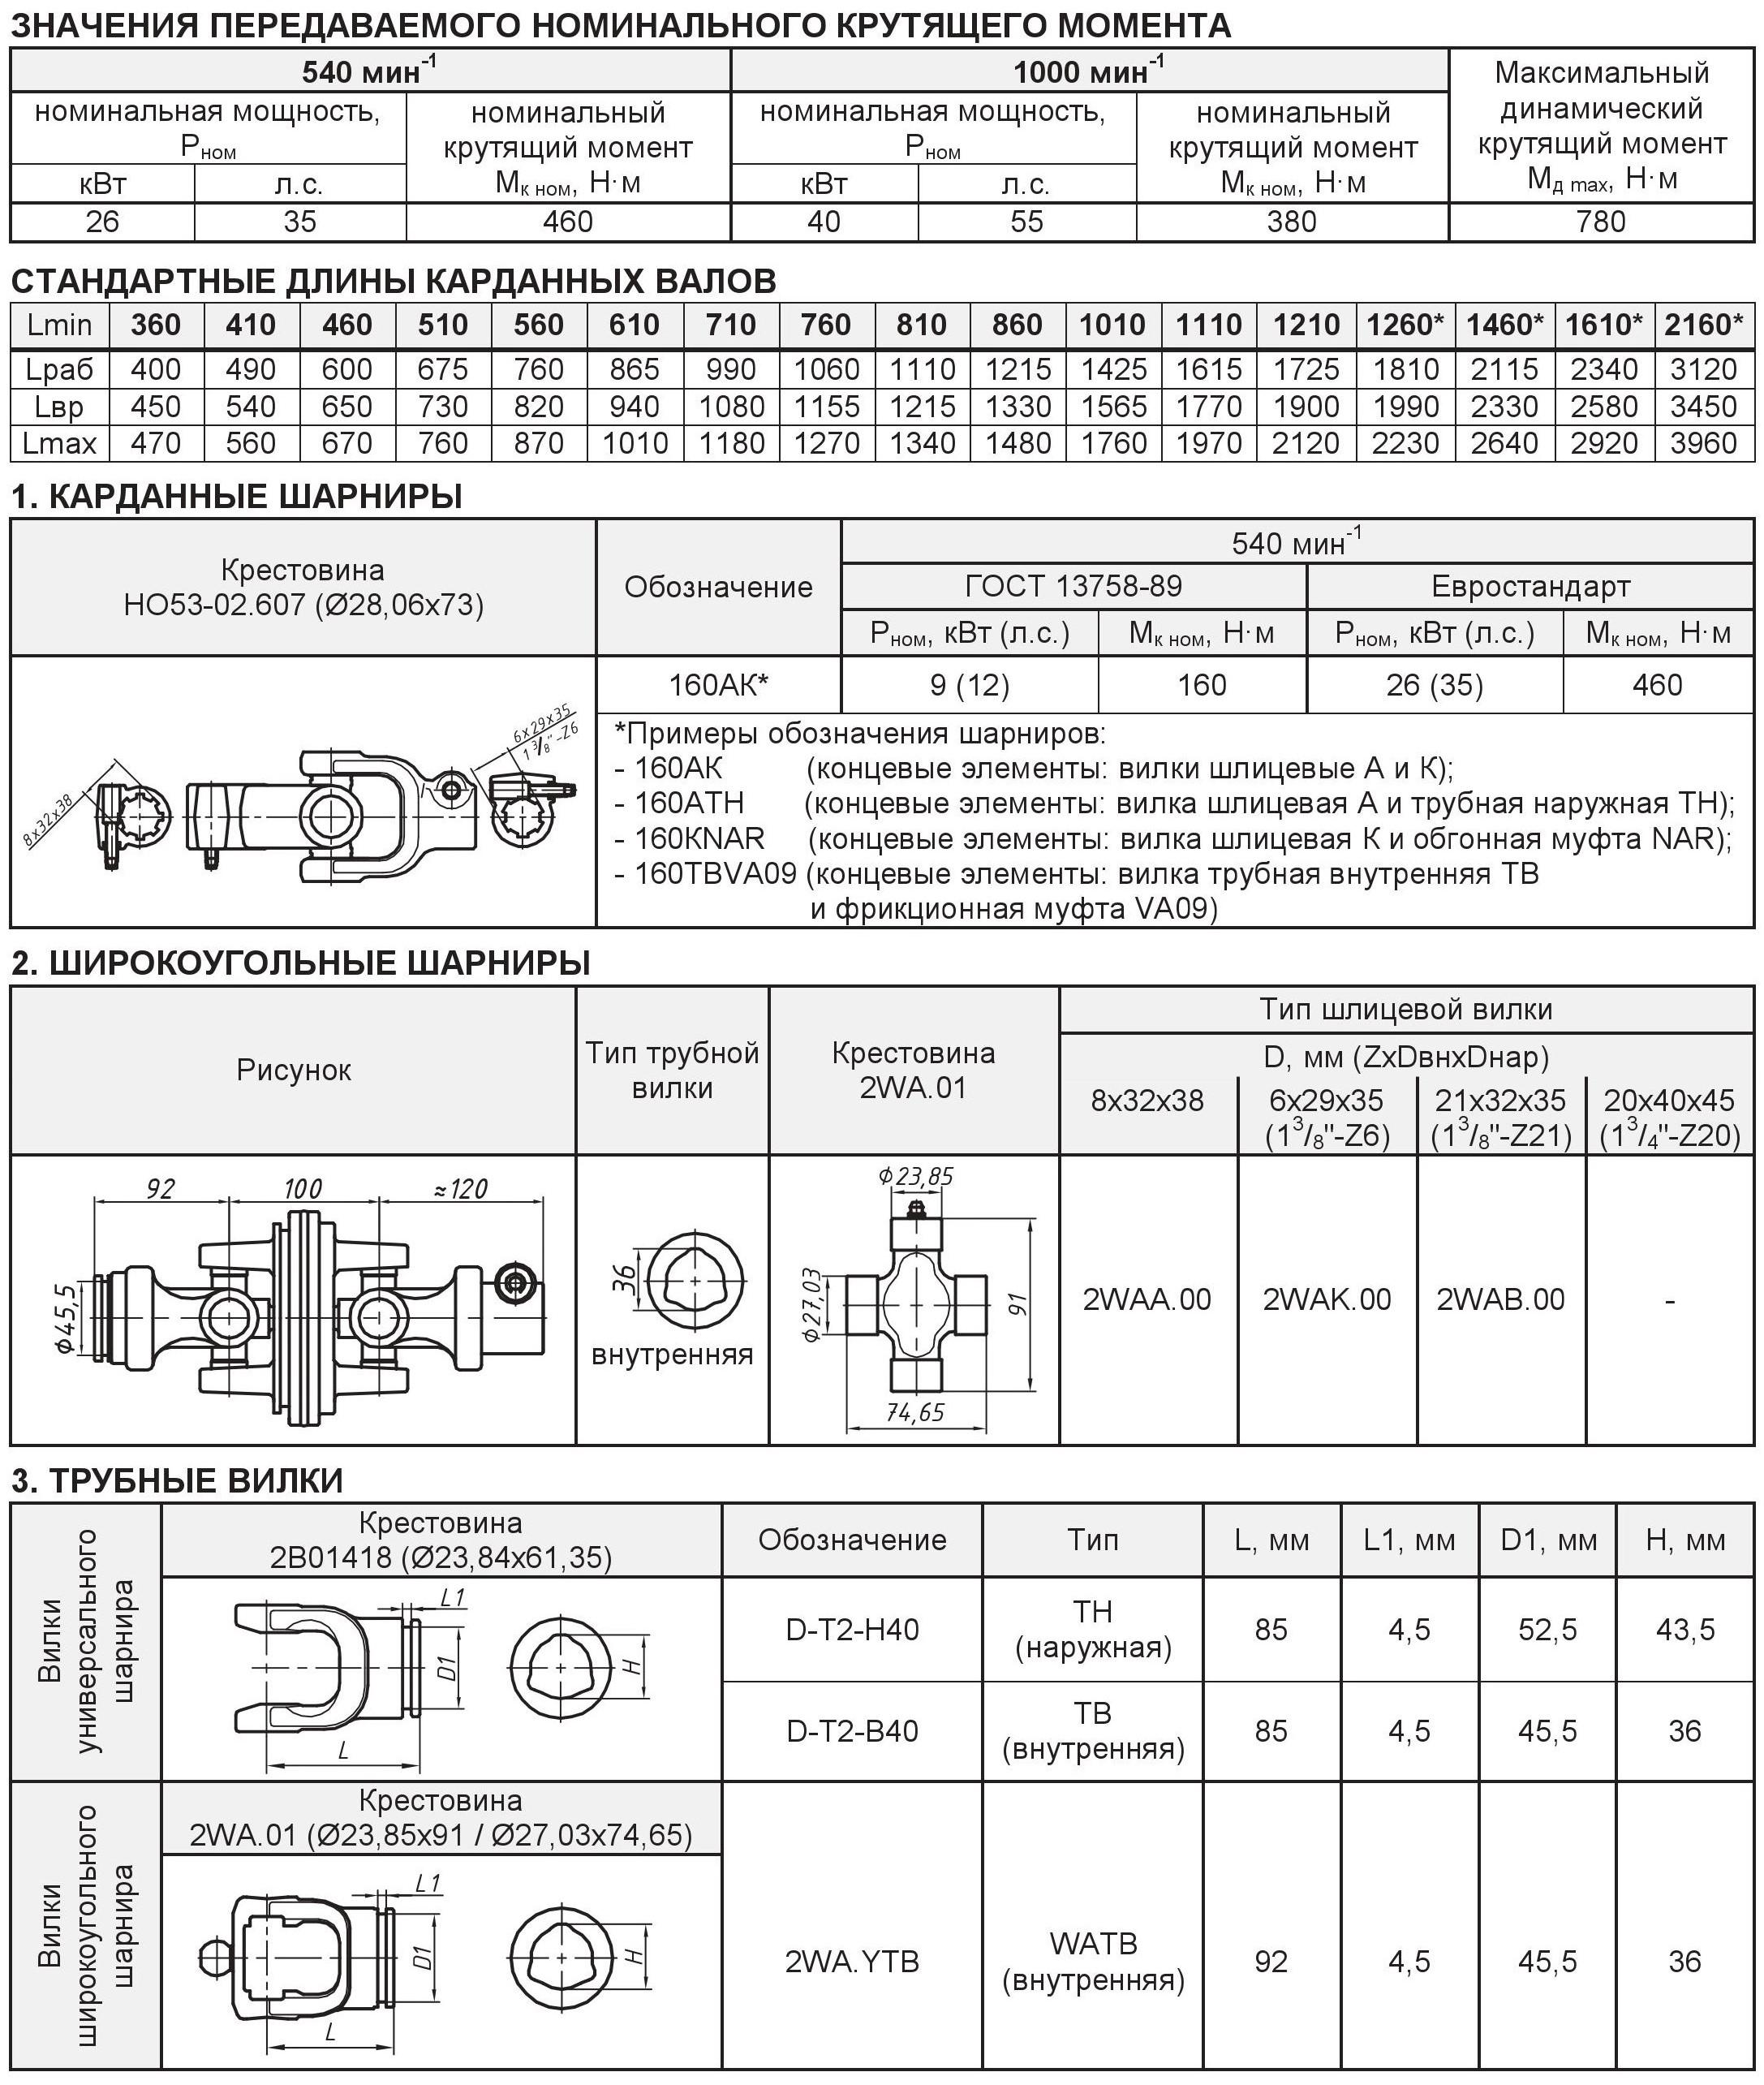 Таблица концевых элементов карданных валов типа T2